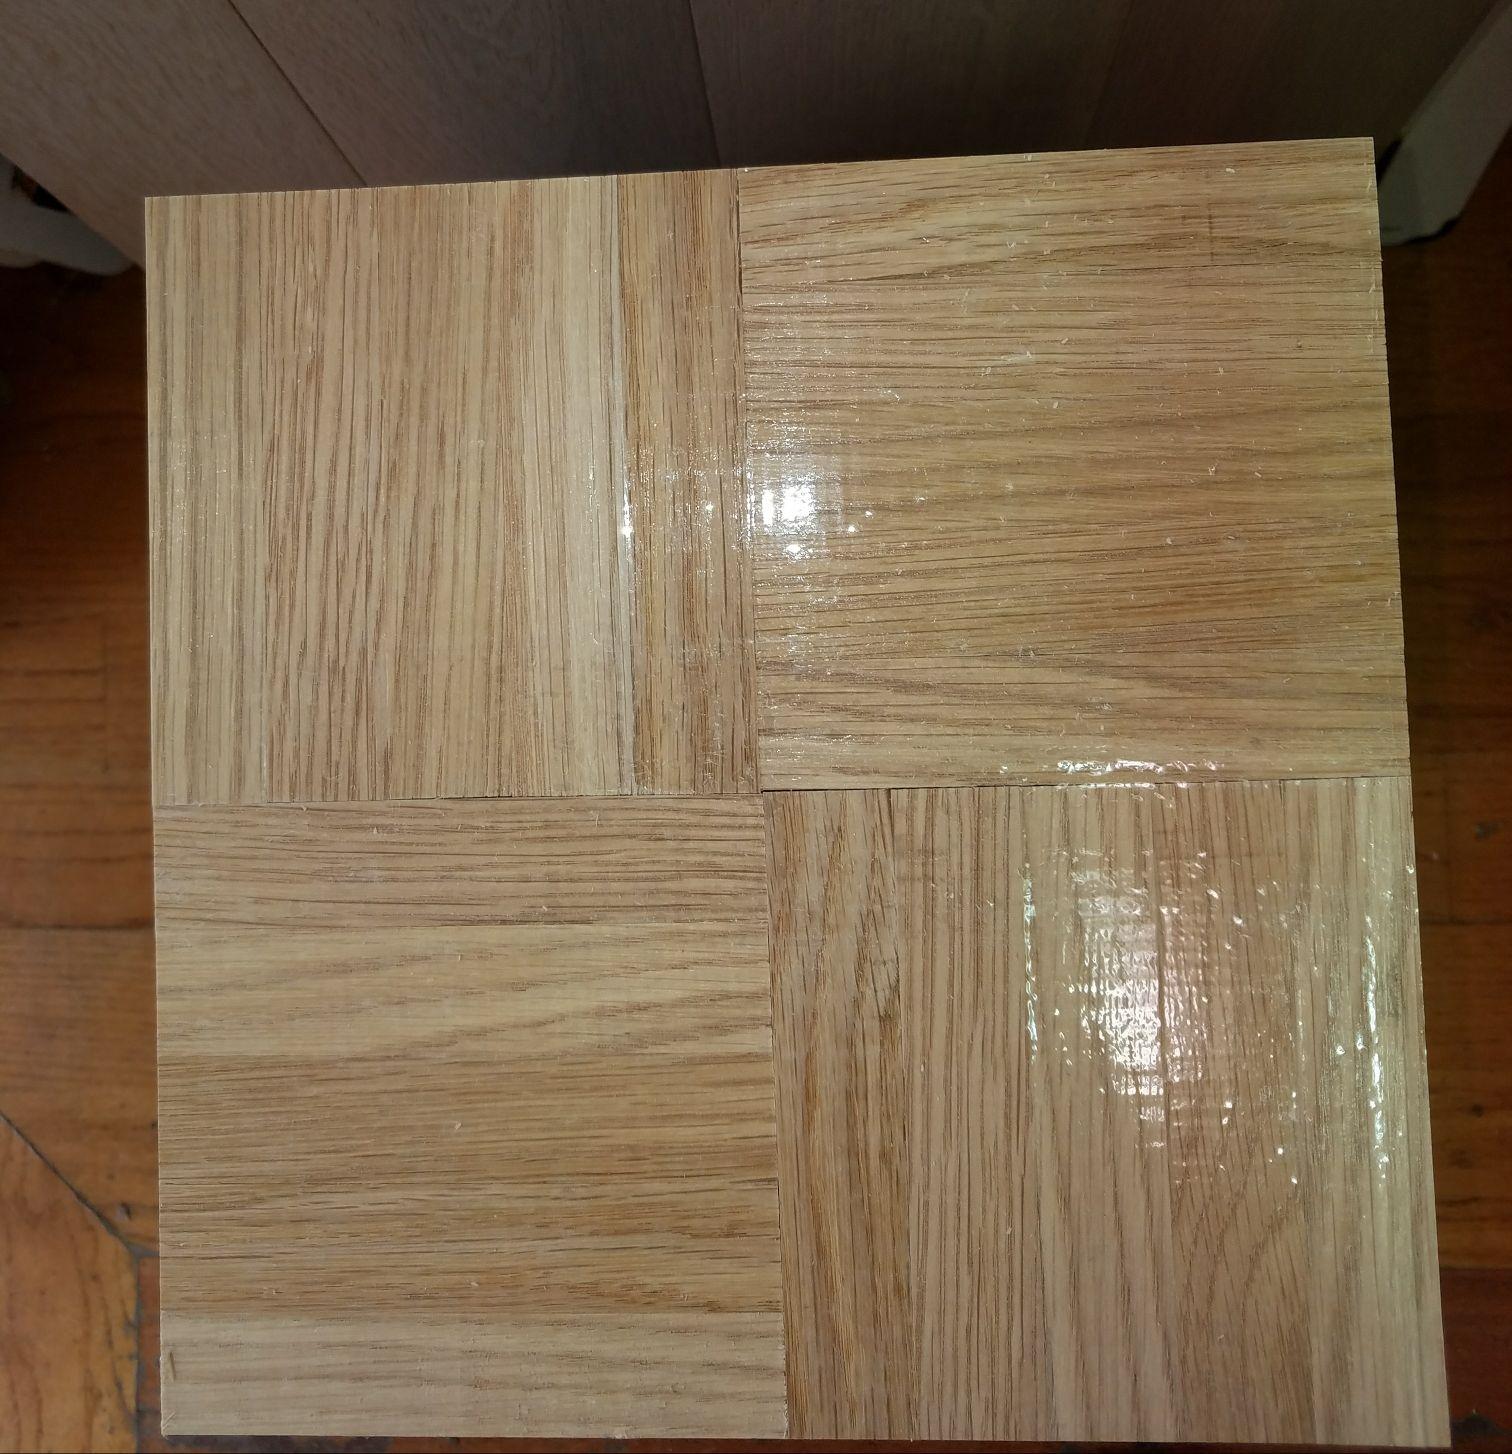 Parquet Wood Floor Tiles Page 2 Home Flooring Ideas